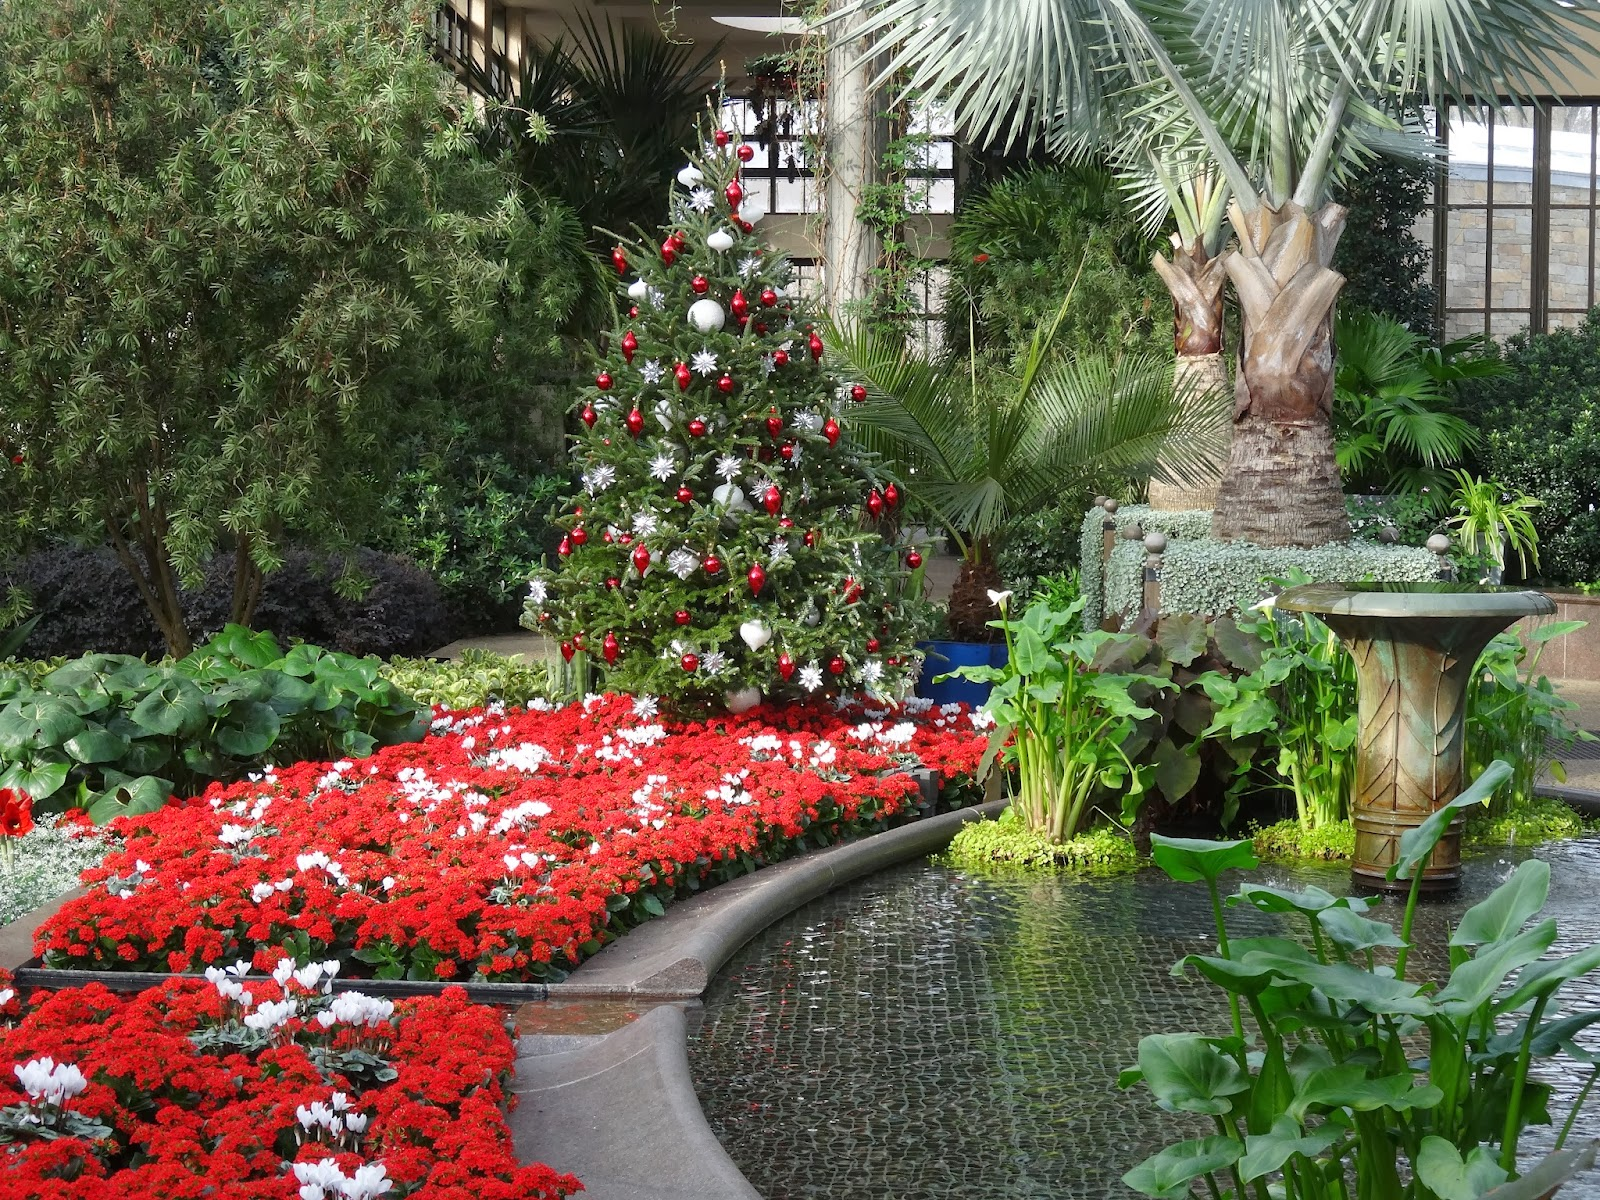 Love, Joy and Peas: Christmas at Longwood Gardens